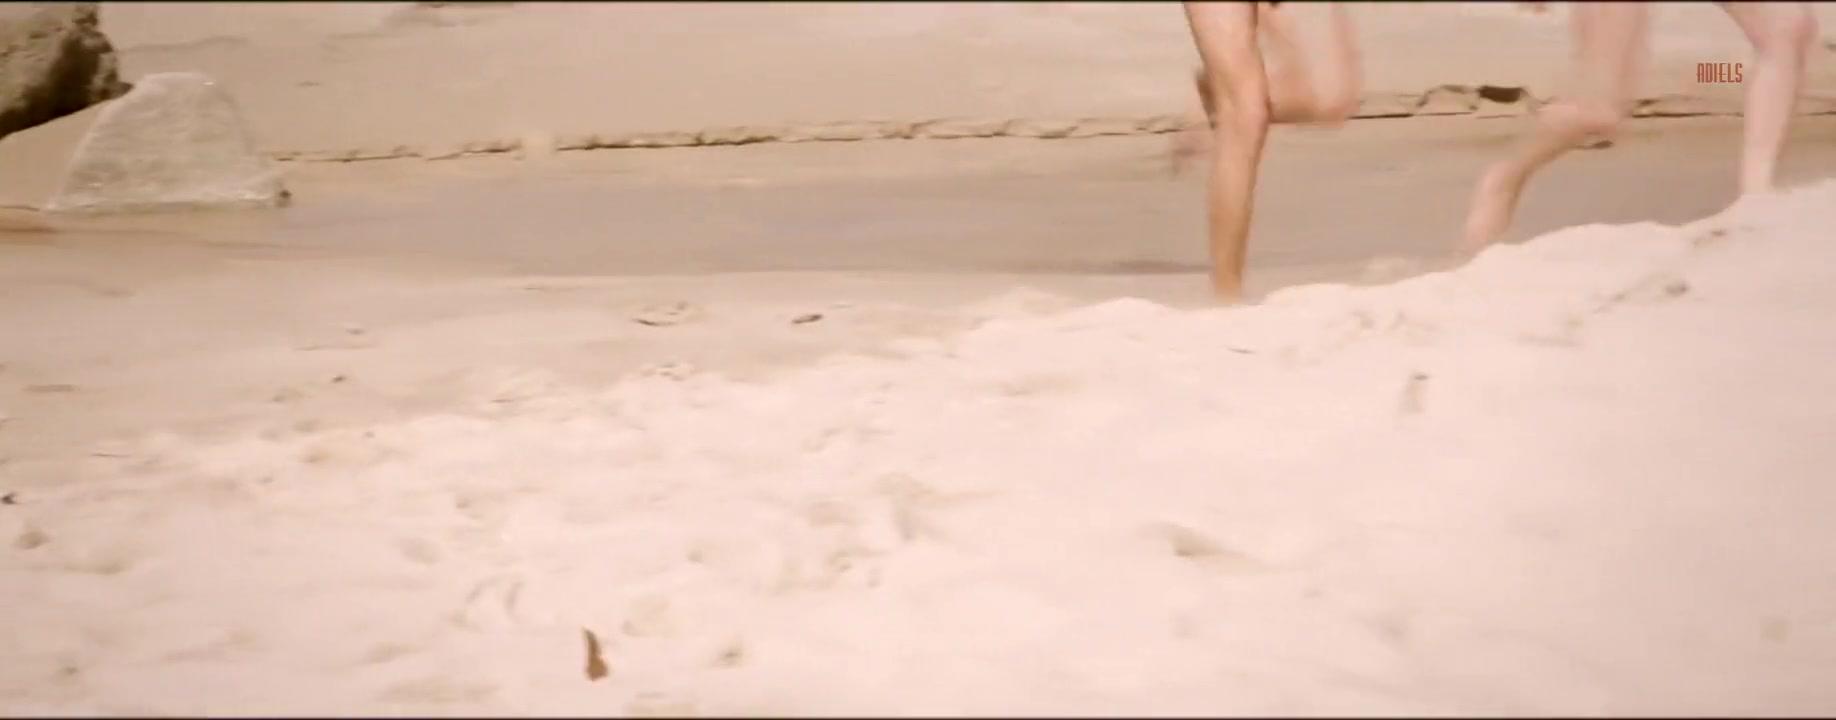 Sprintax online dating Nude gallery